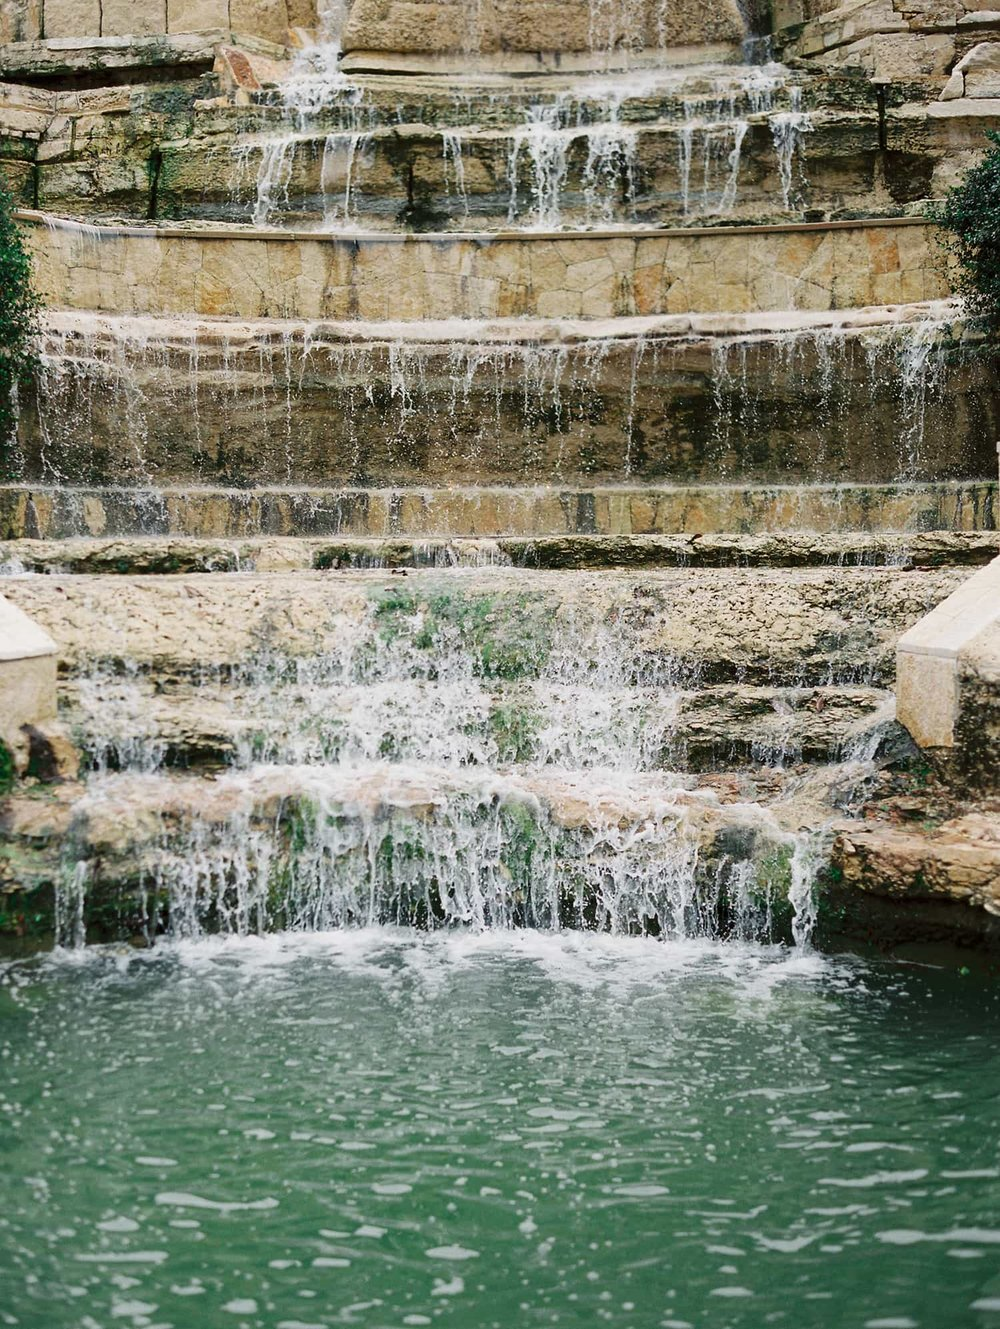 Wedding venue waterfall